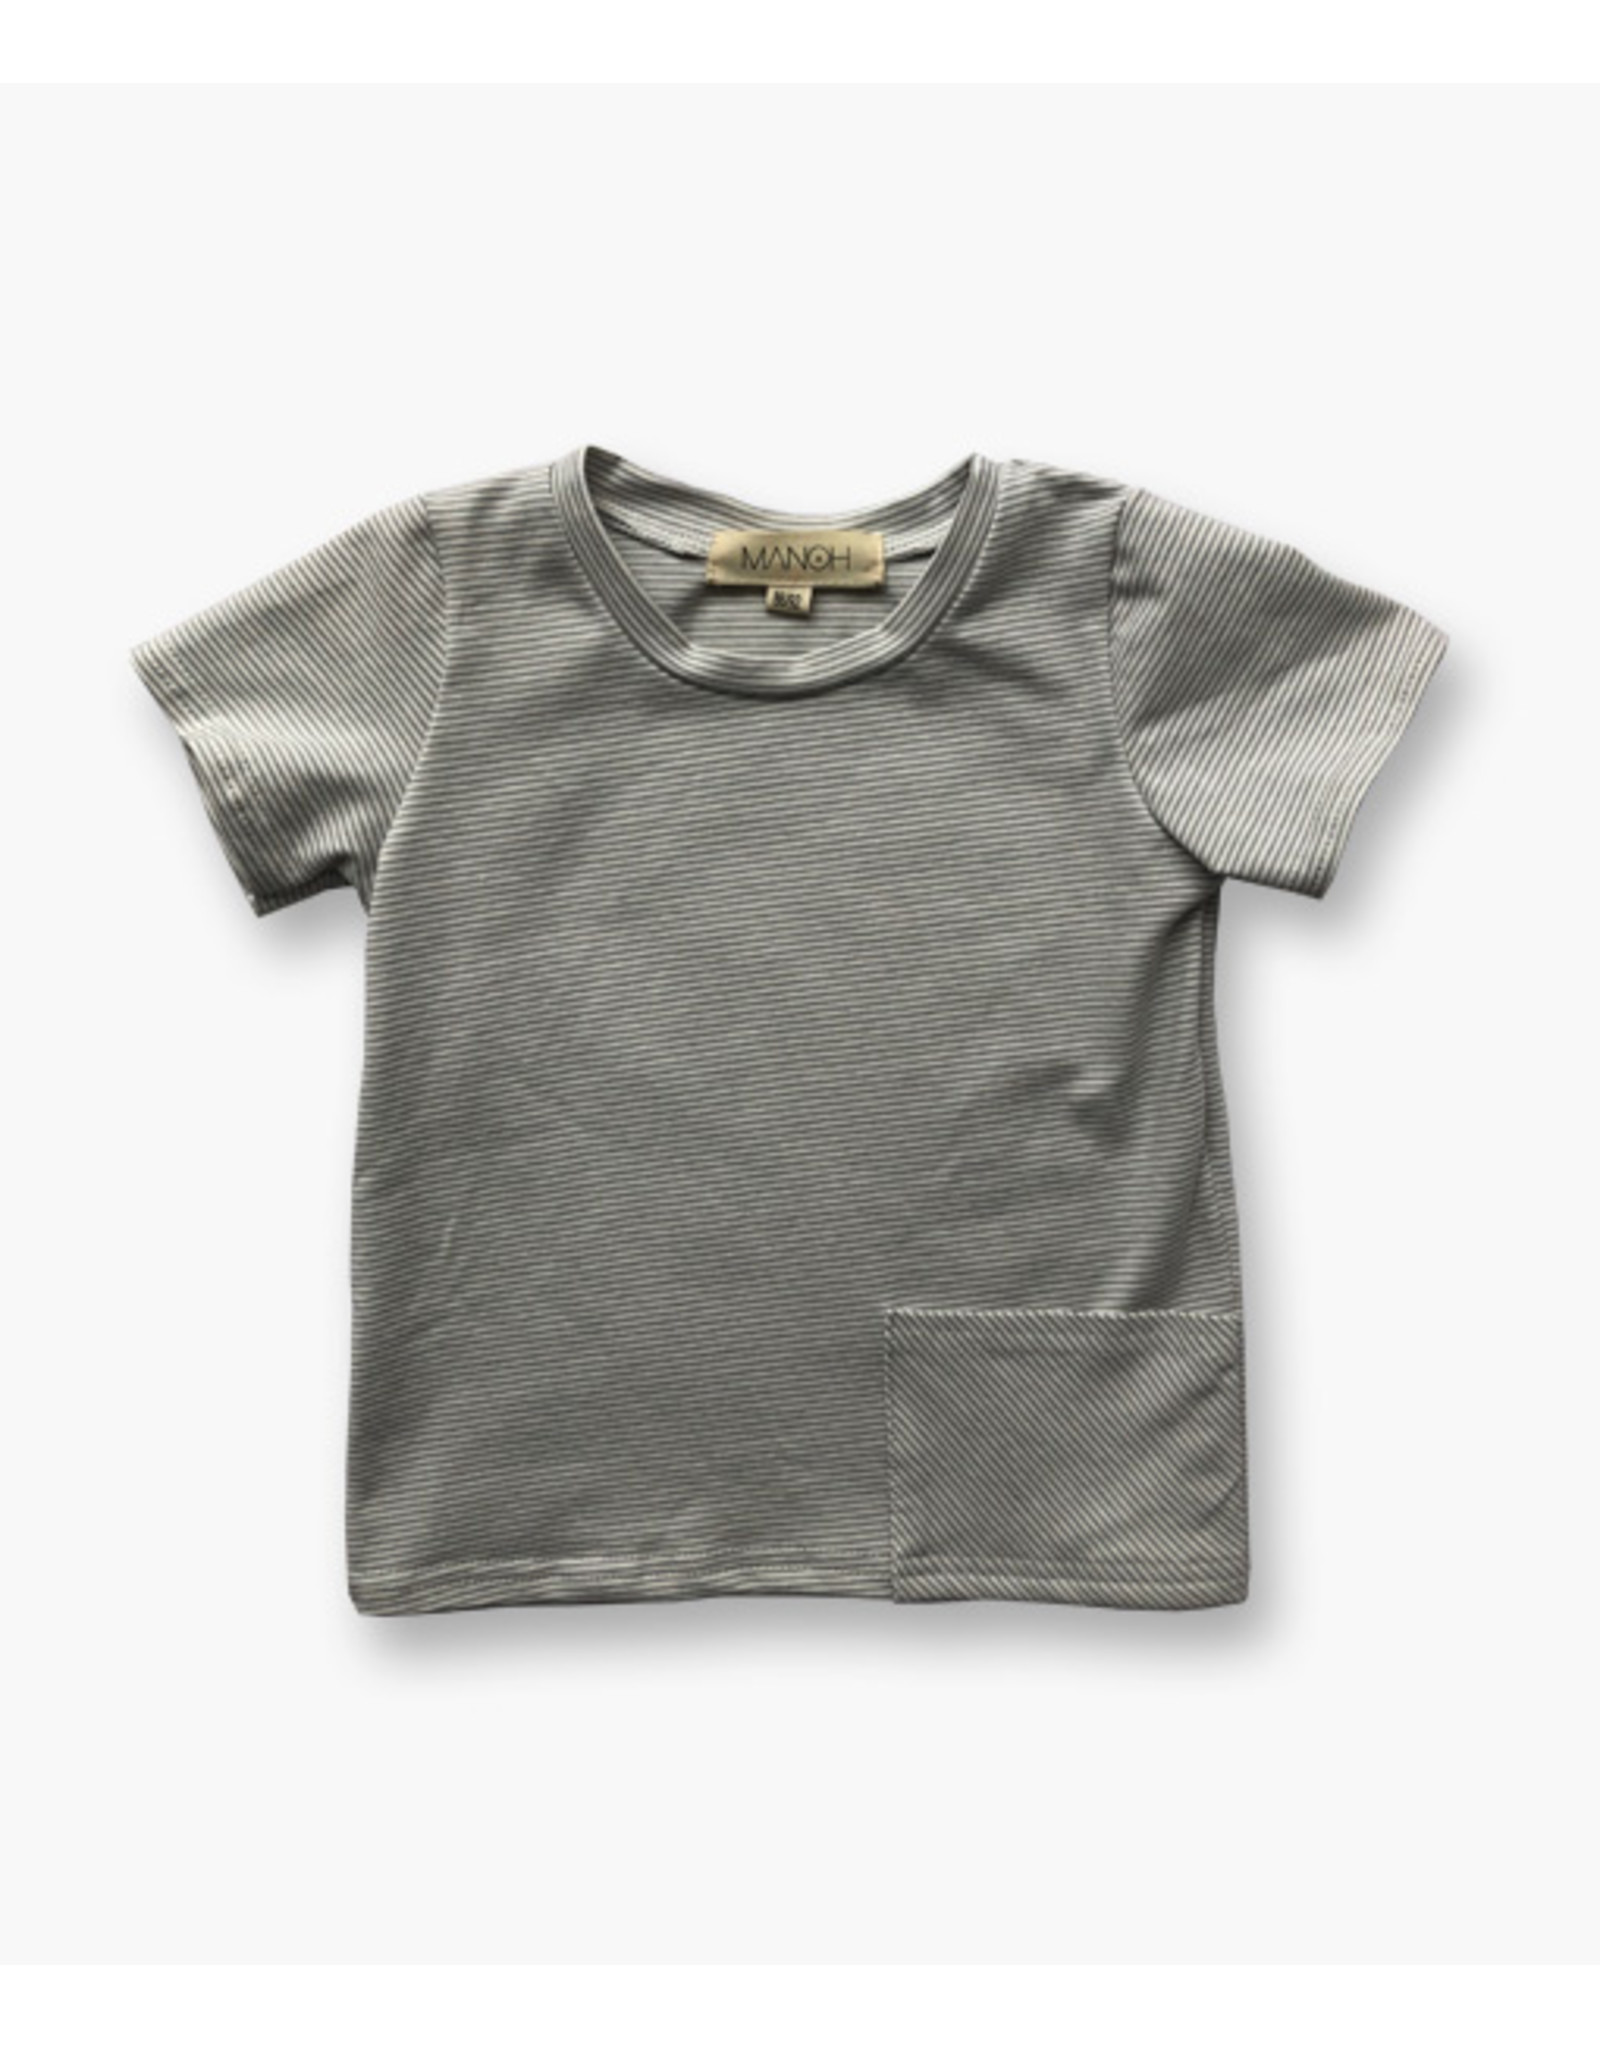 Manoh t-shirt stripe